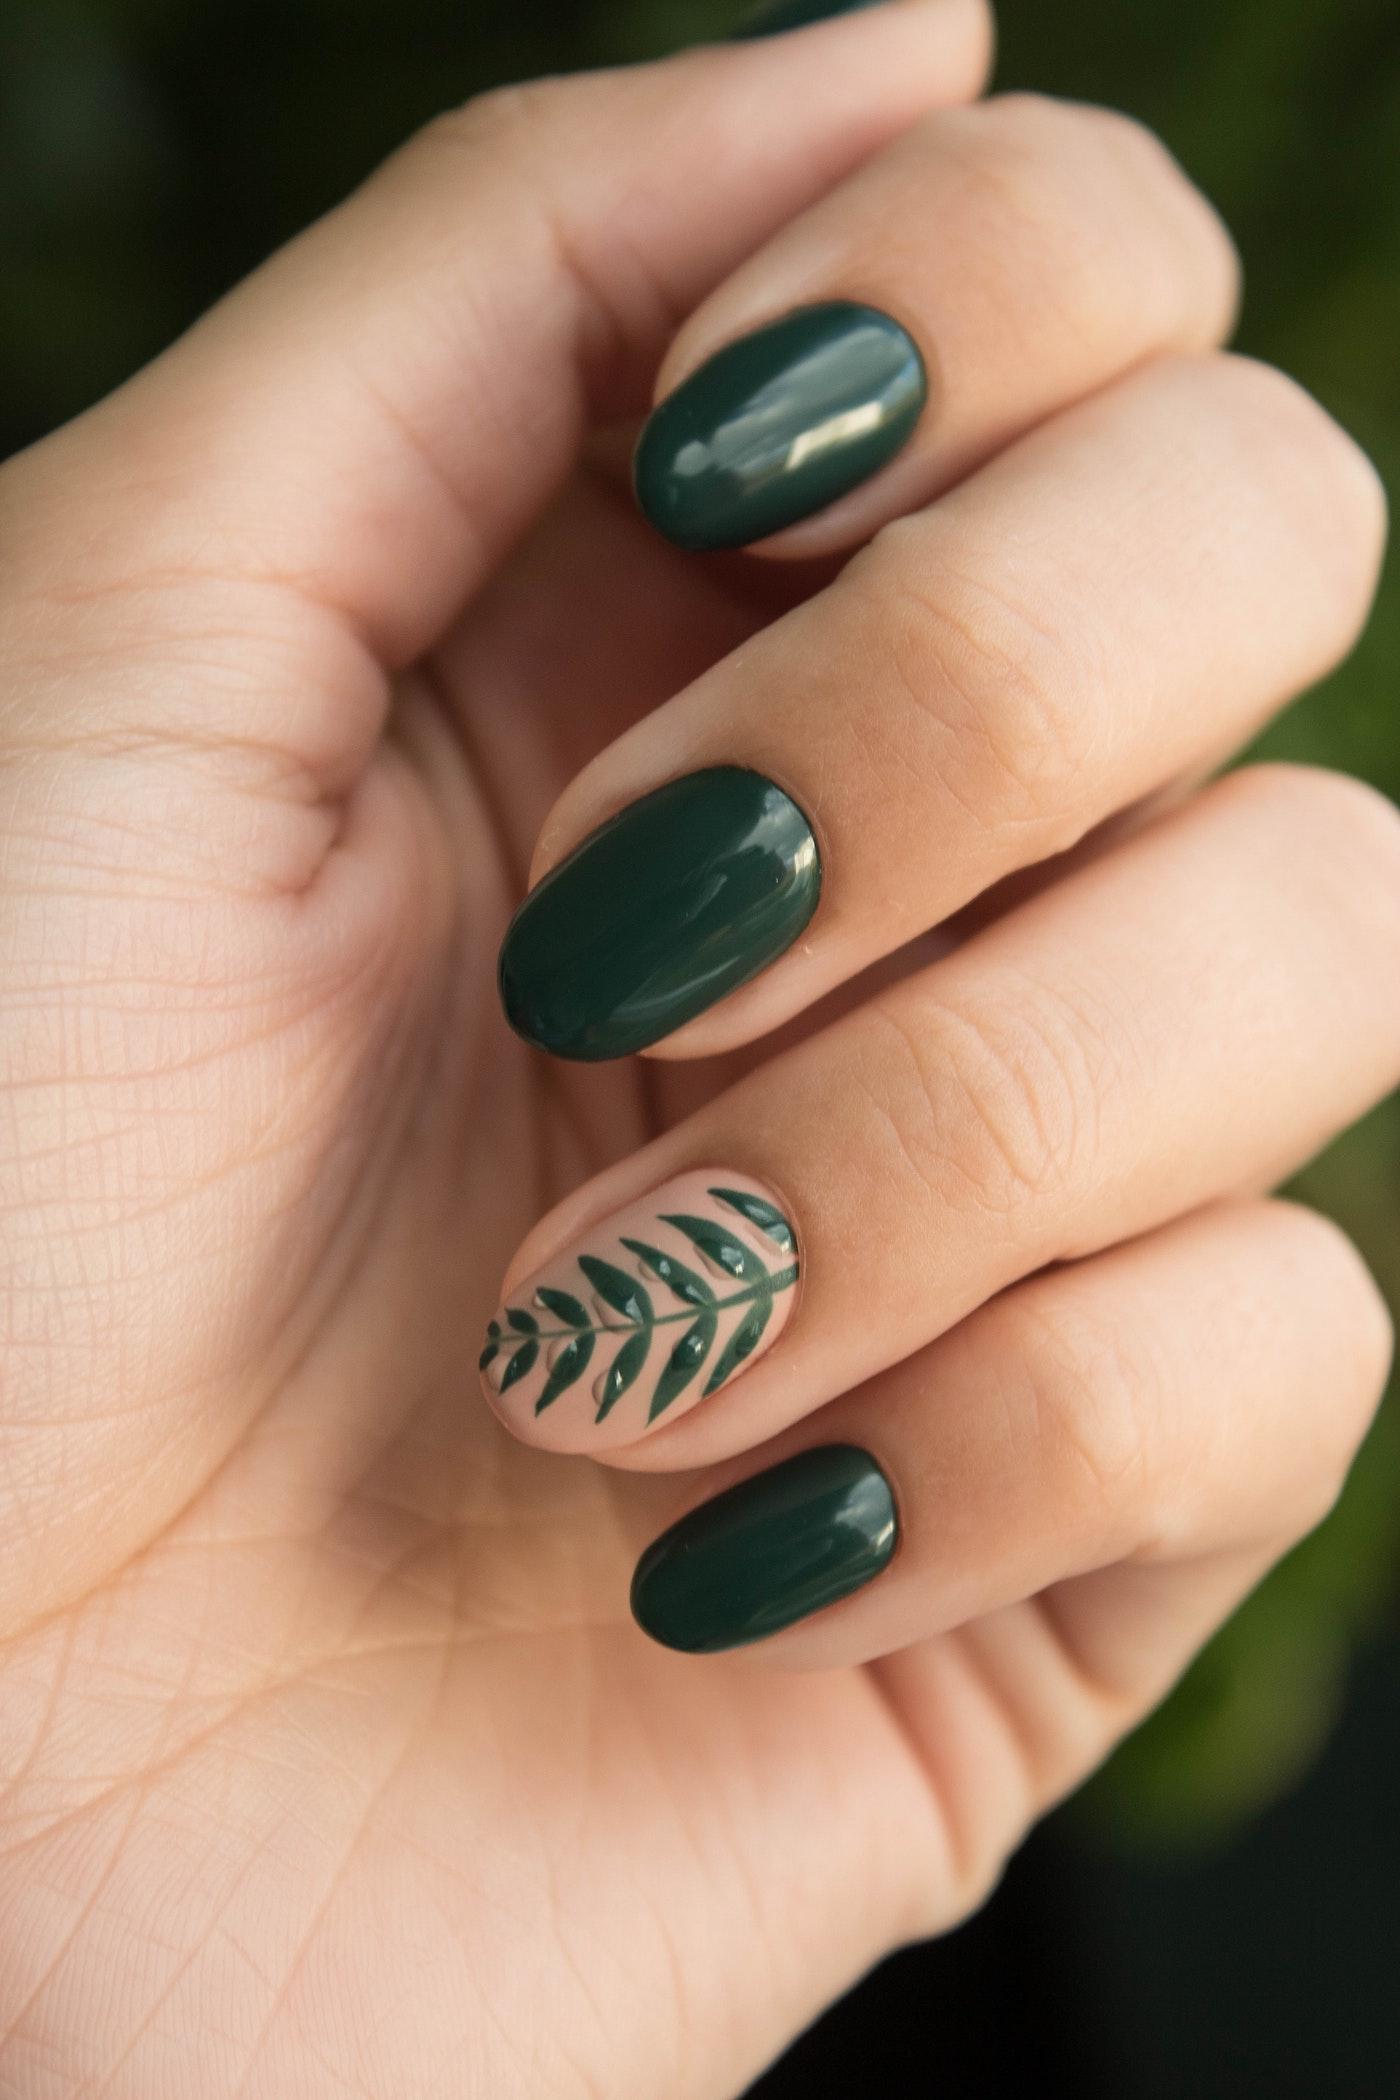 Skingood Garden gesunde Nägel Nail Seeds Erfahrungen starke gesunde Fingernägel